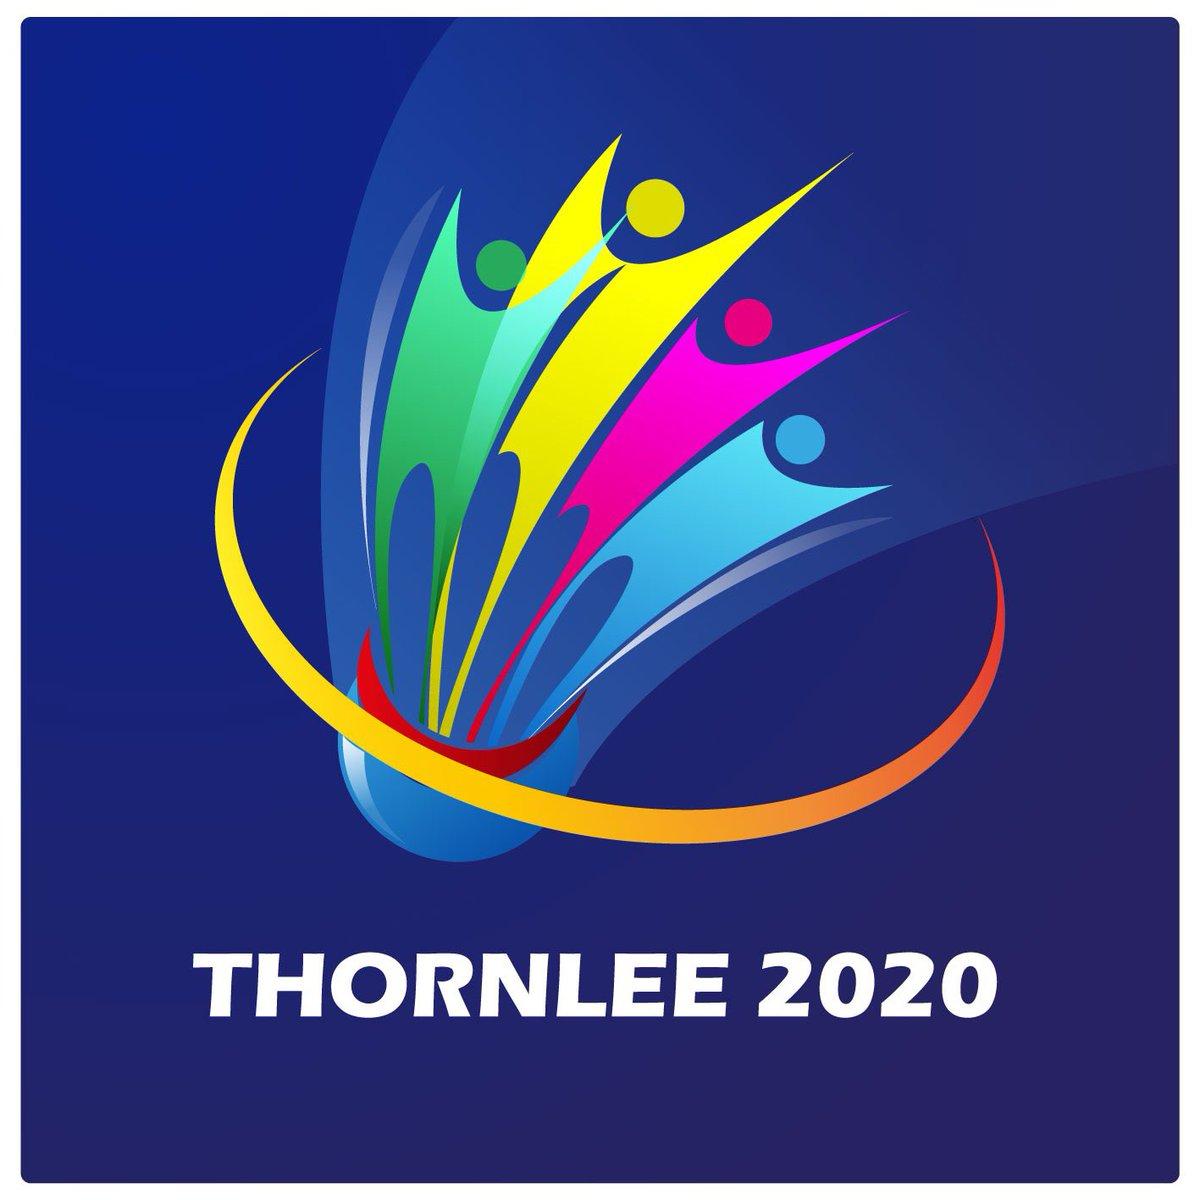 Entries now open for Thornlee 2020... visit http://www.facebook.com/langsidebadminton… for full info #Glasgow #badminton